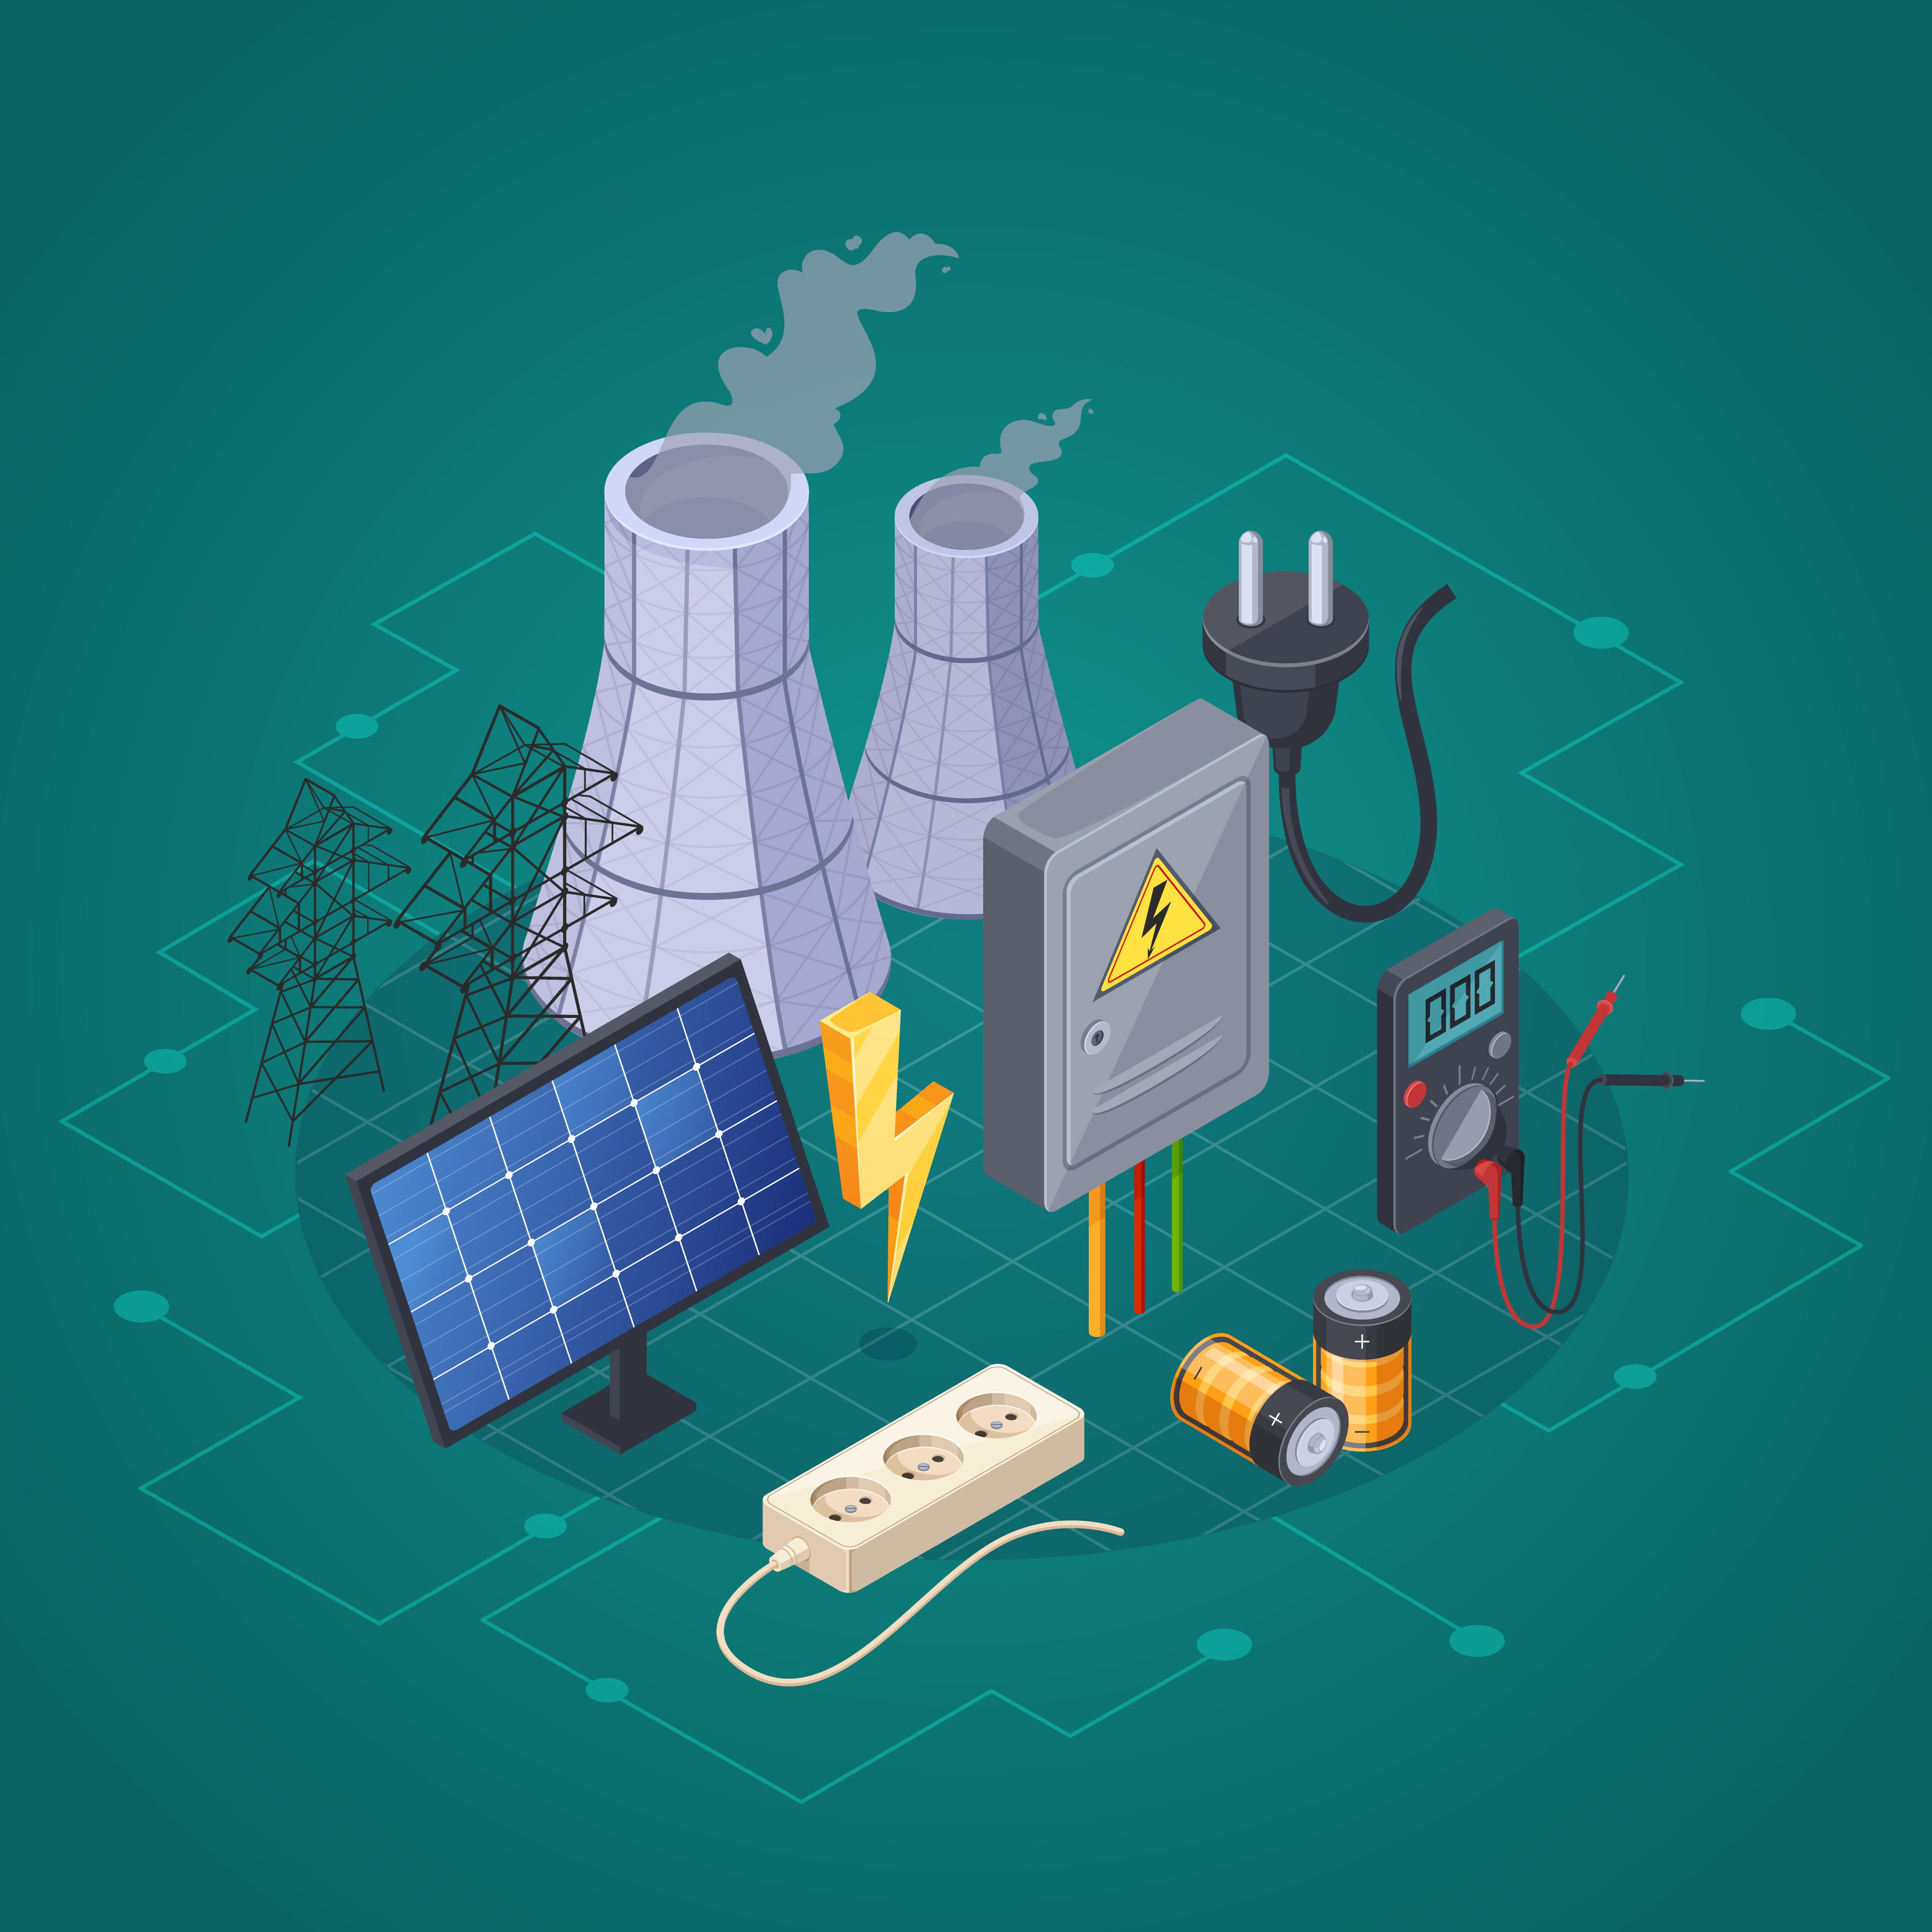 Aneel dispõe que Distribuidoras de Energia devem ter Canal de Denúncias